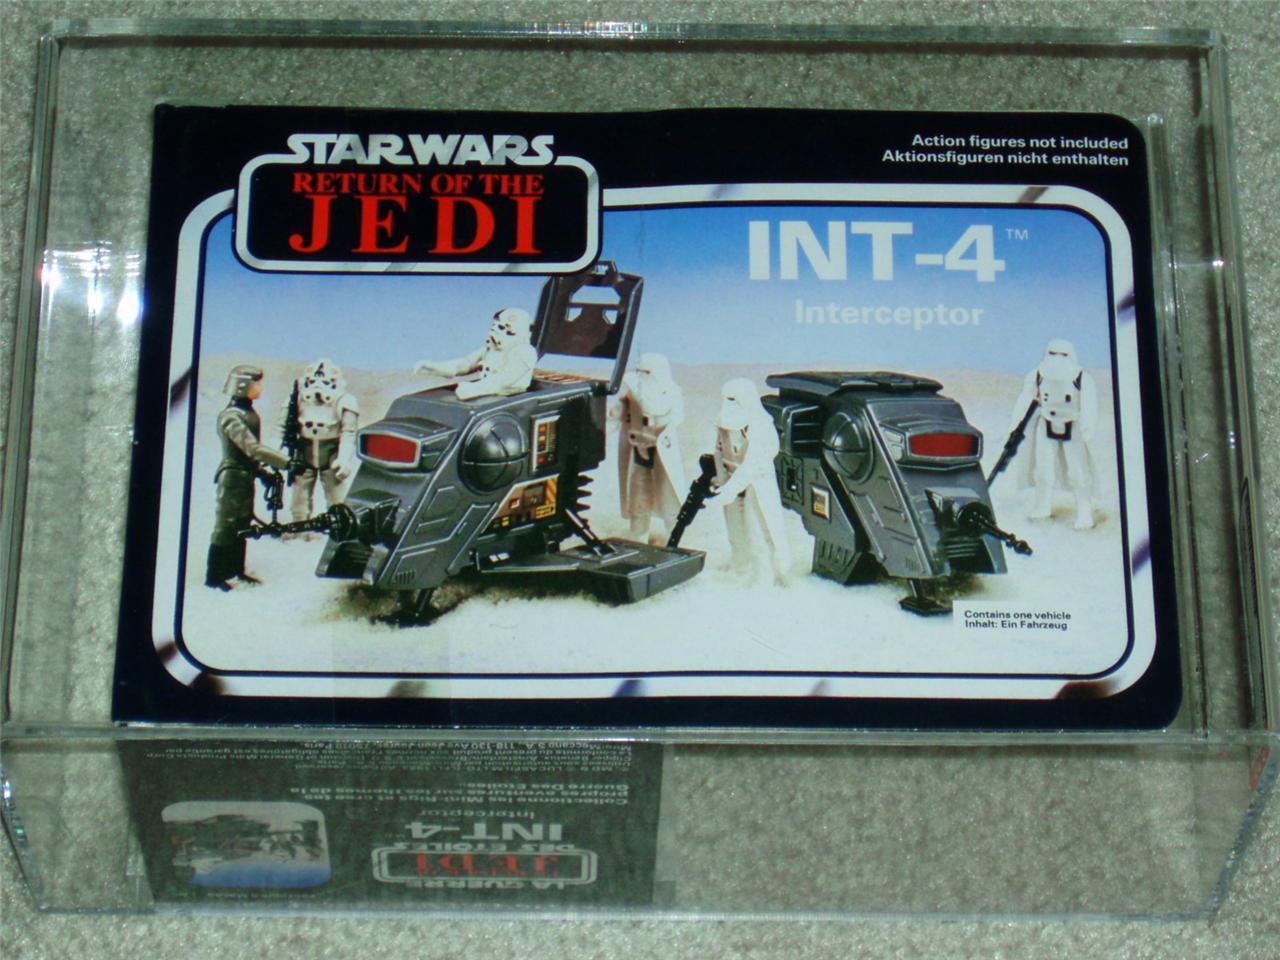 Vintage Star Wars 1983 AFA U90 PALITOY/CLIPPER INT-4 MISB ROTJ Uncirculated MIB